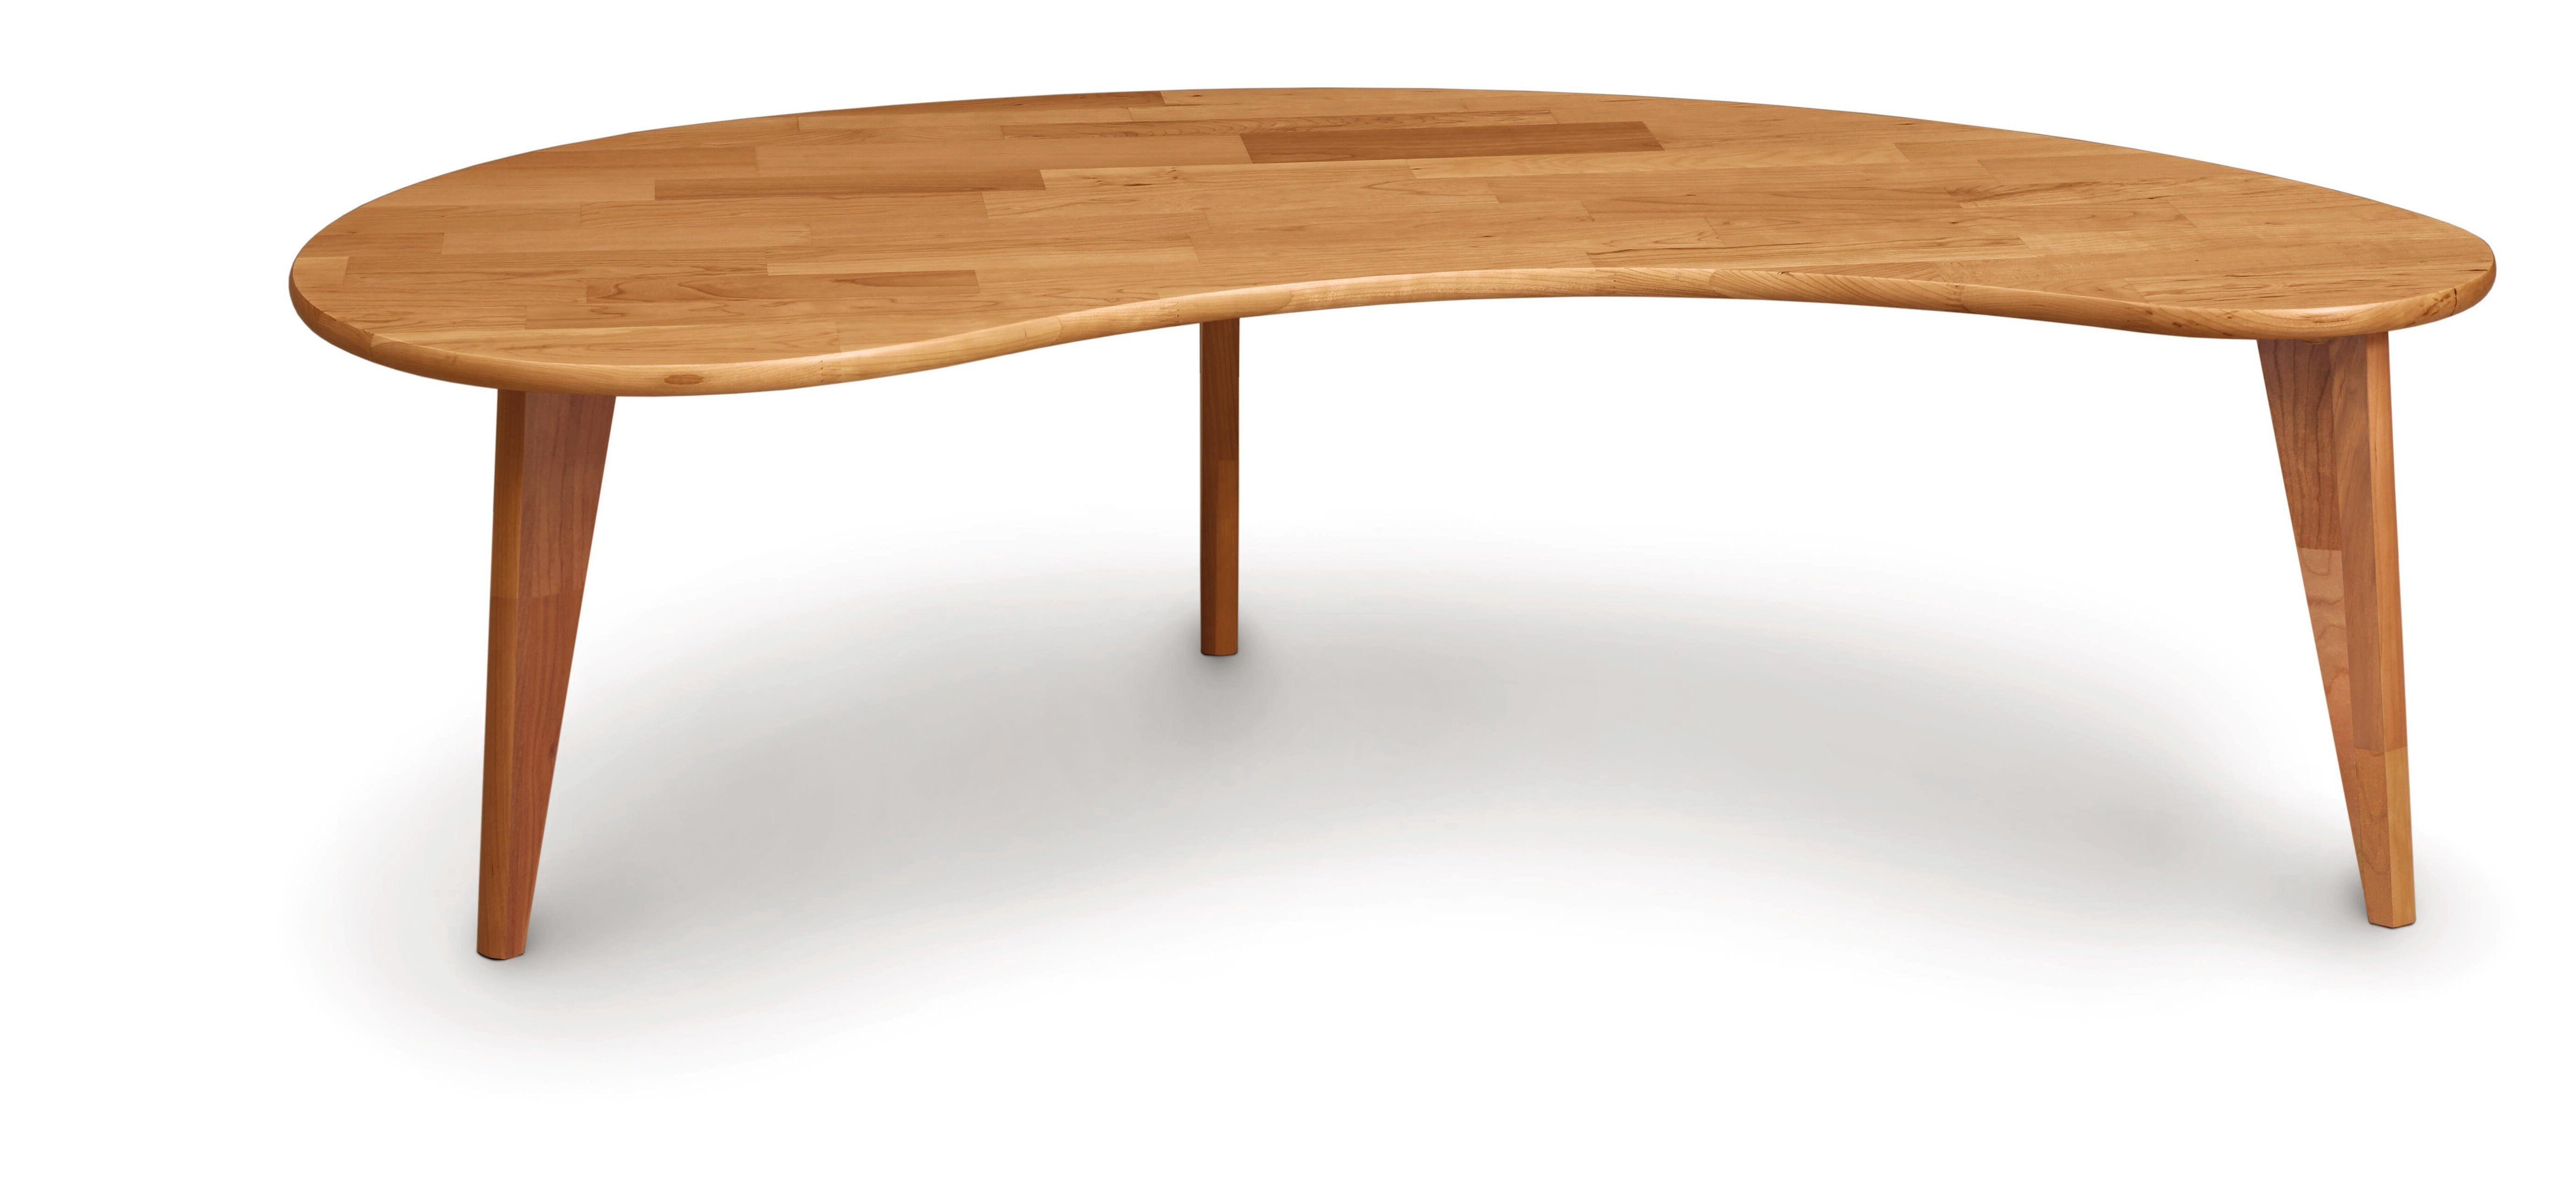 Copeland furniture essentials kidney shaped coffee table wayfair